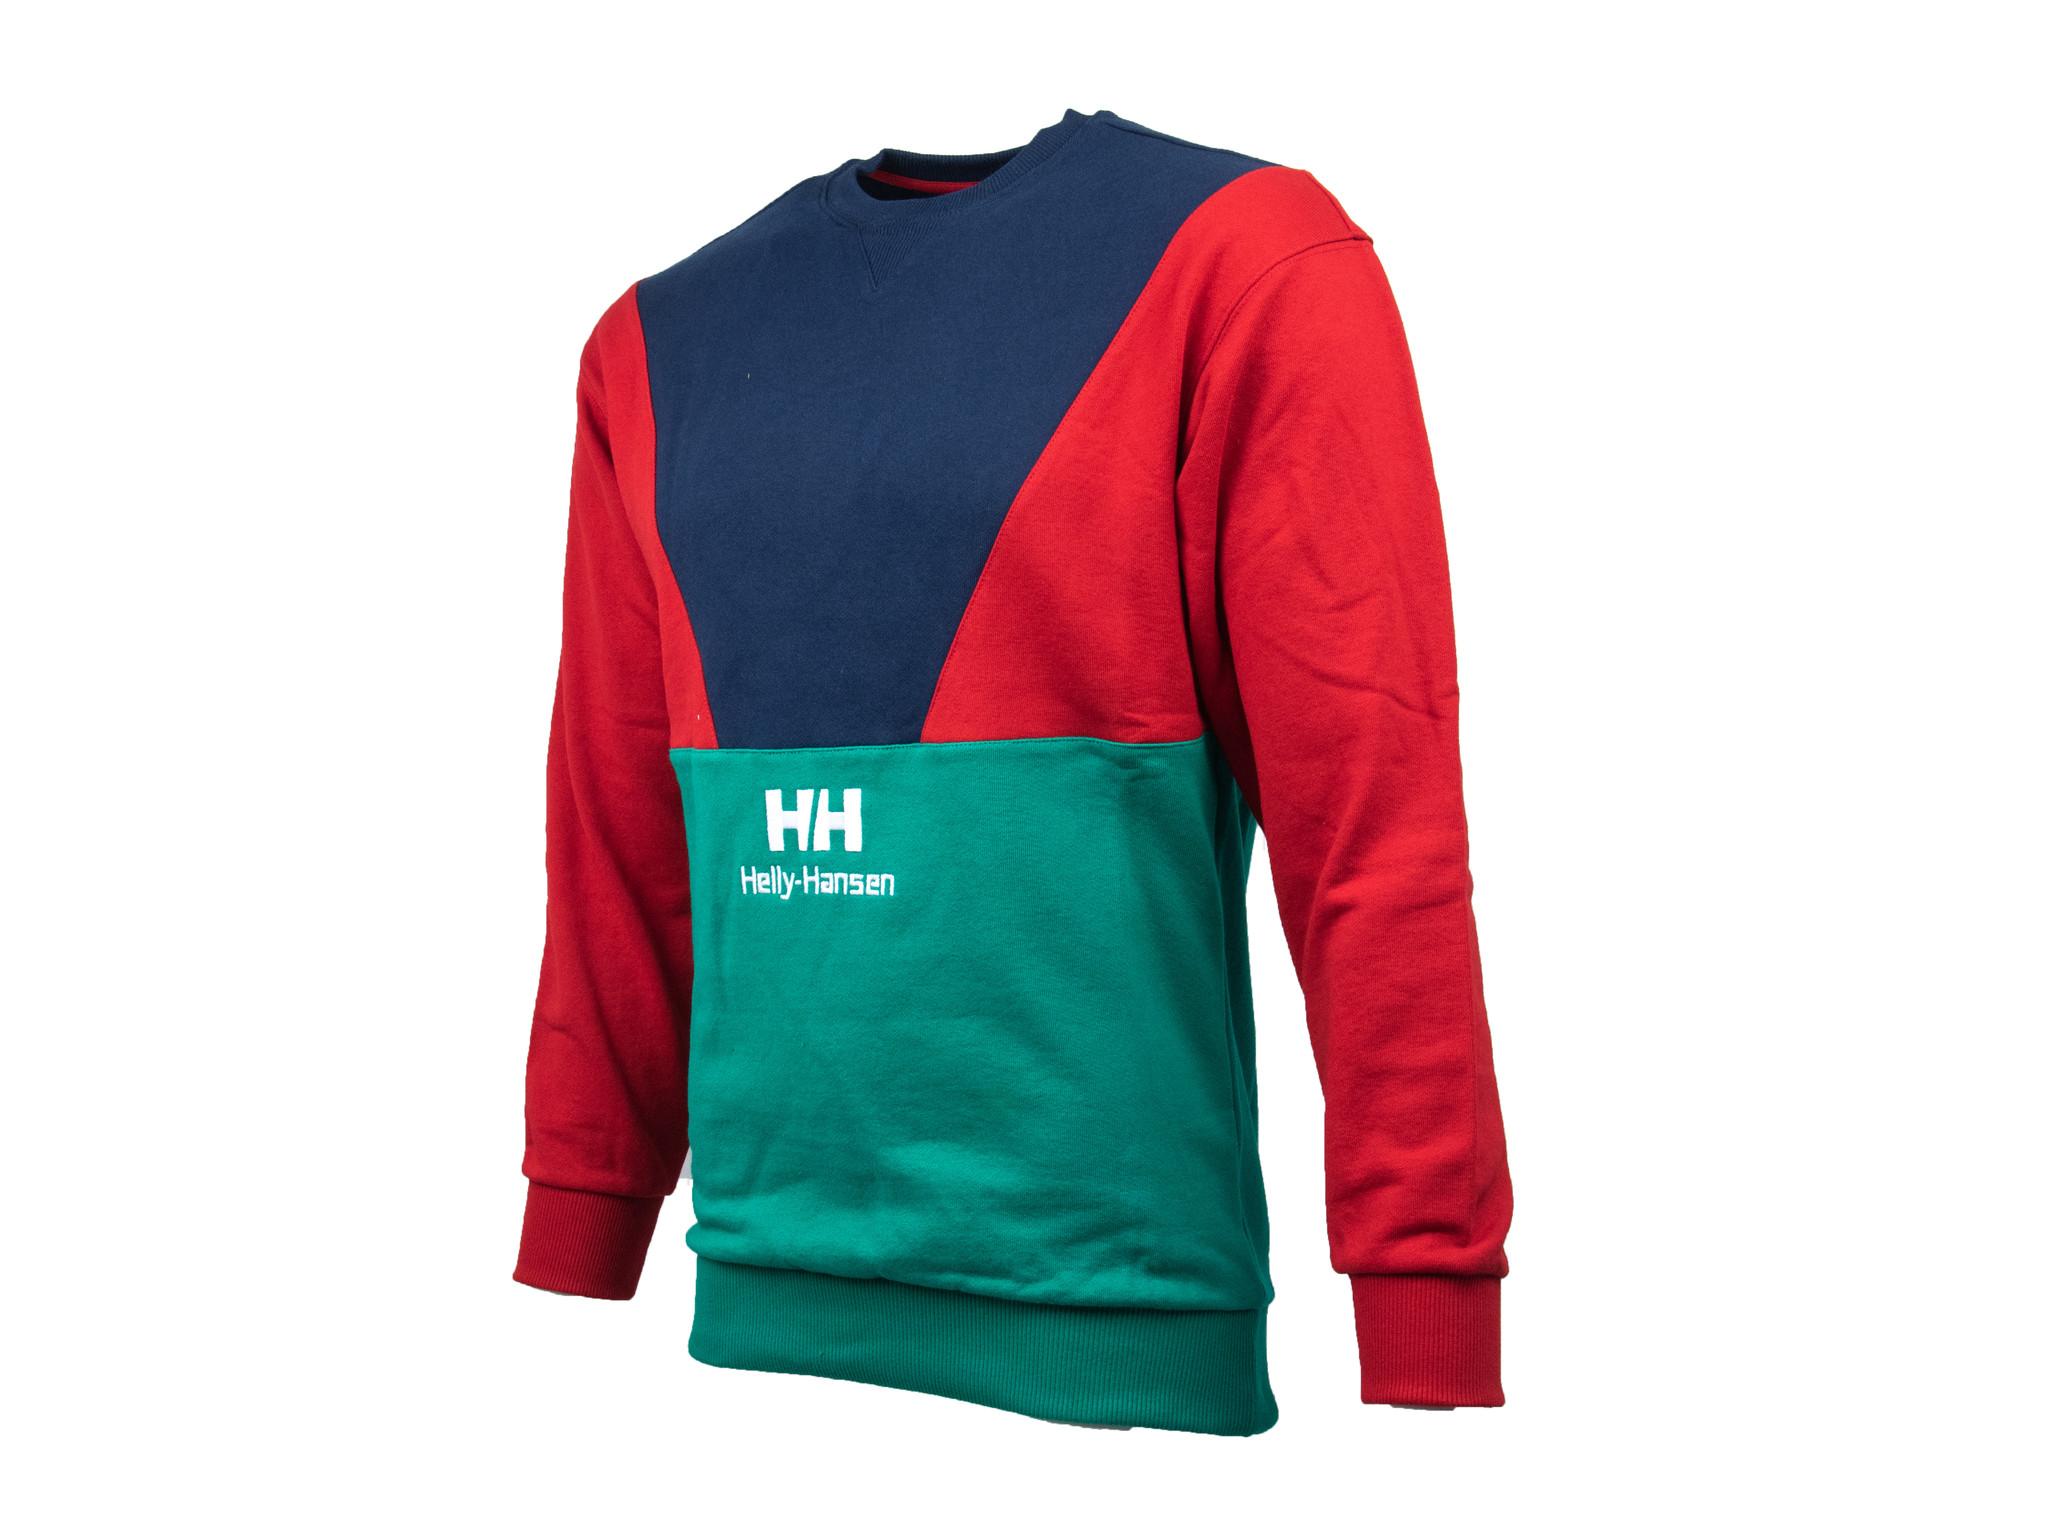 Urban Retro Sweatshirt Pepper Green 29849 471